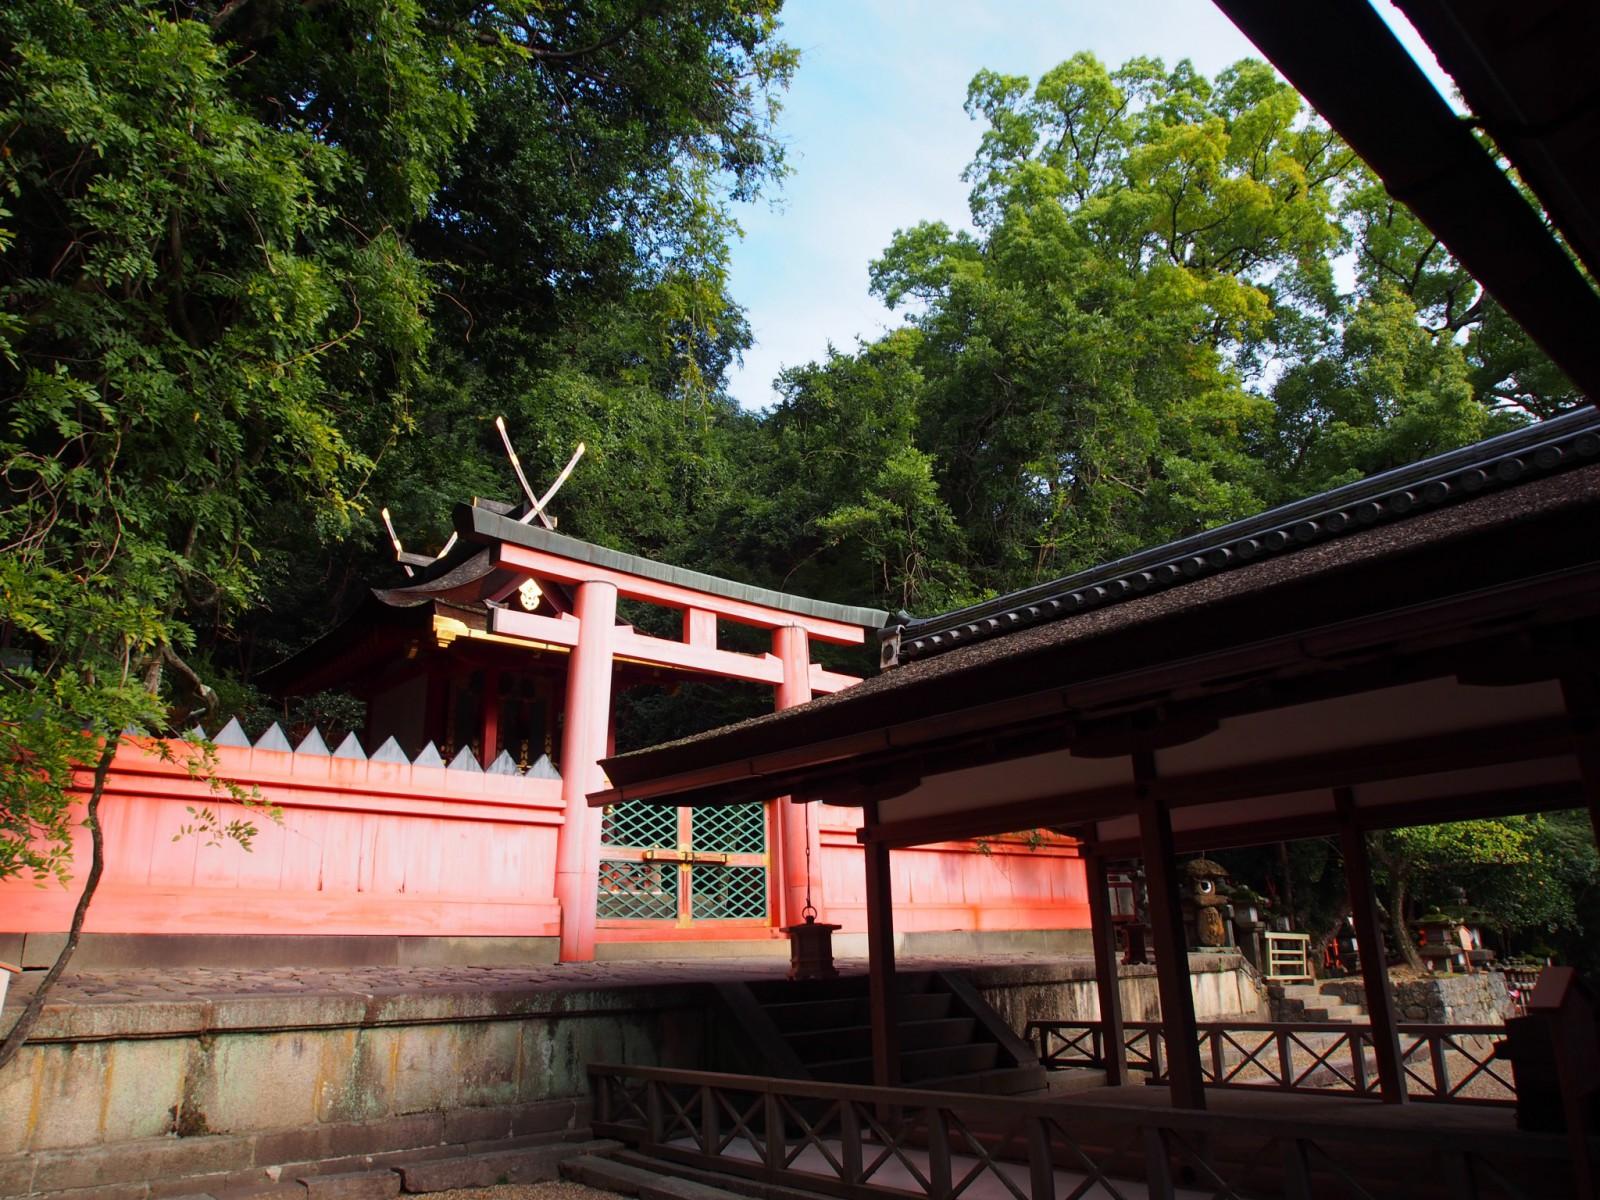 若宮神社(春日大社)の拝舎と本殿